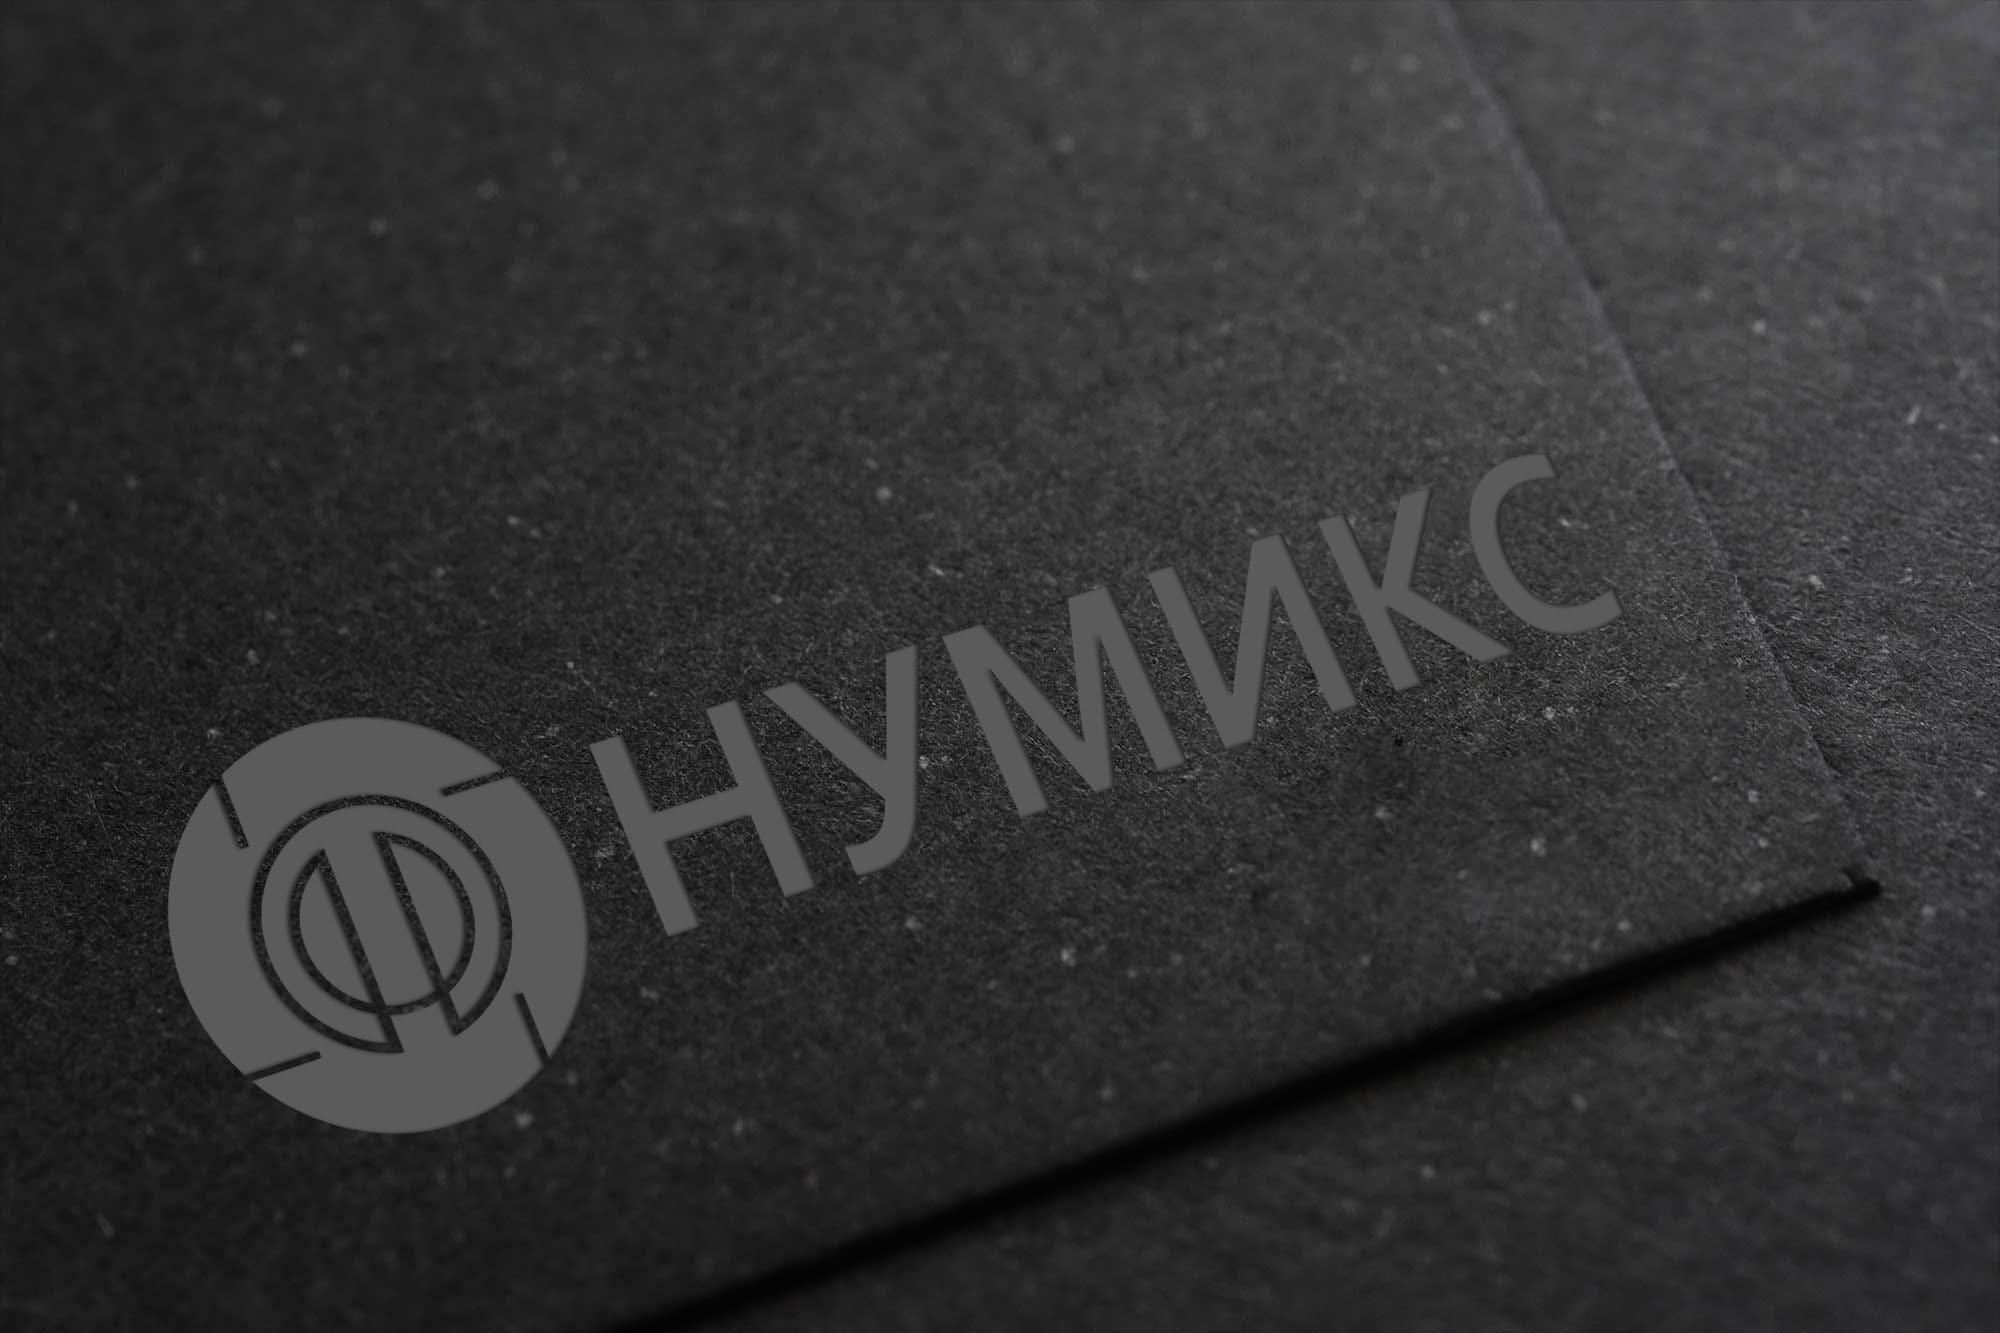 Логотип для интернет-магазина фото f_8175ec811886faa3.jpg